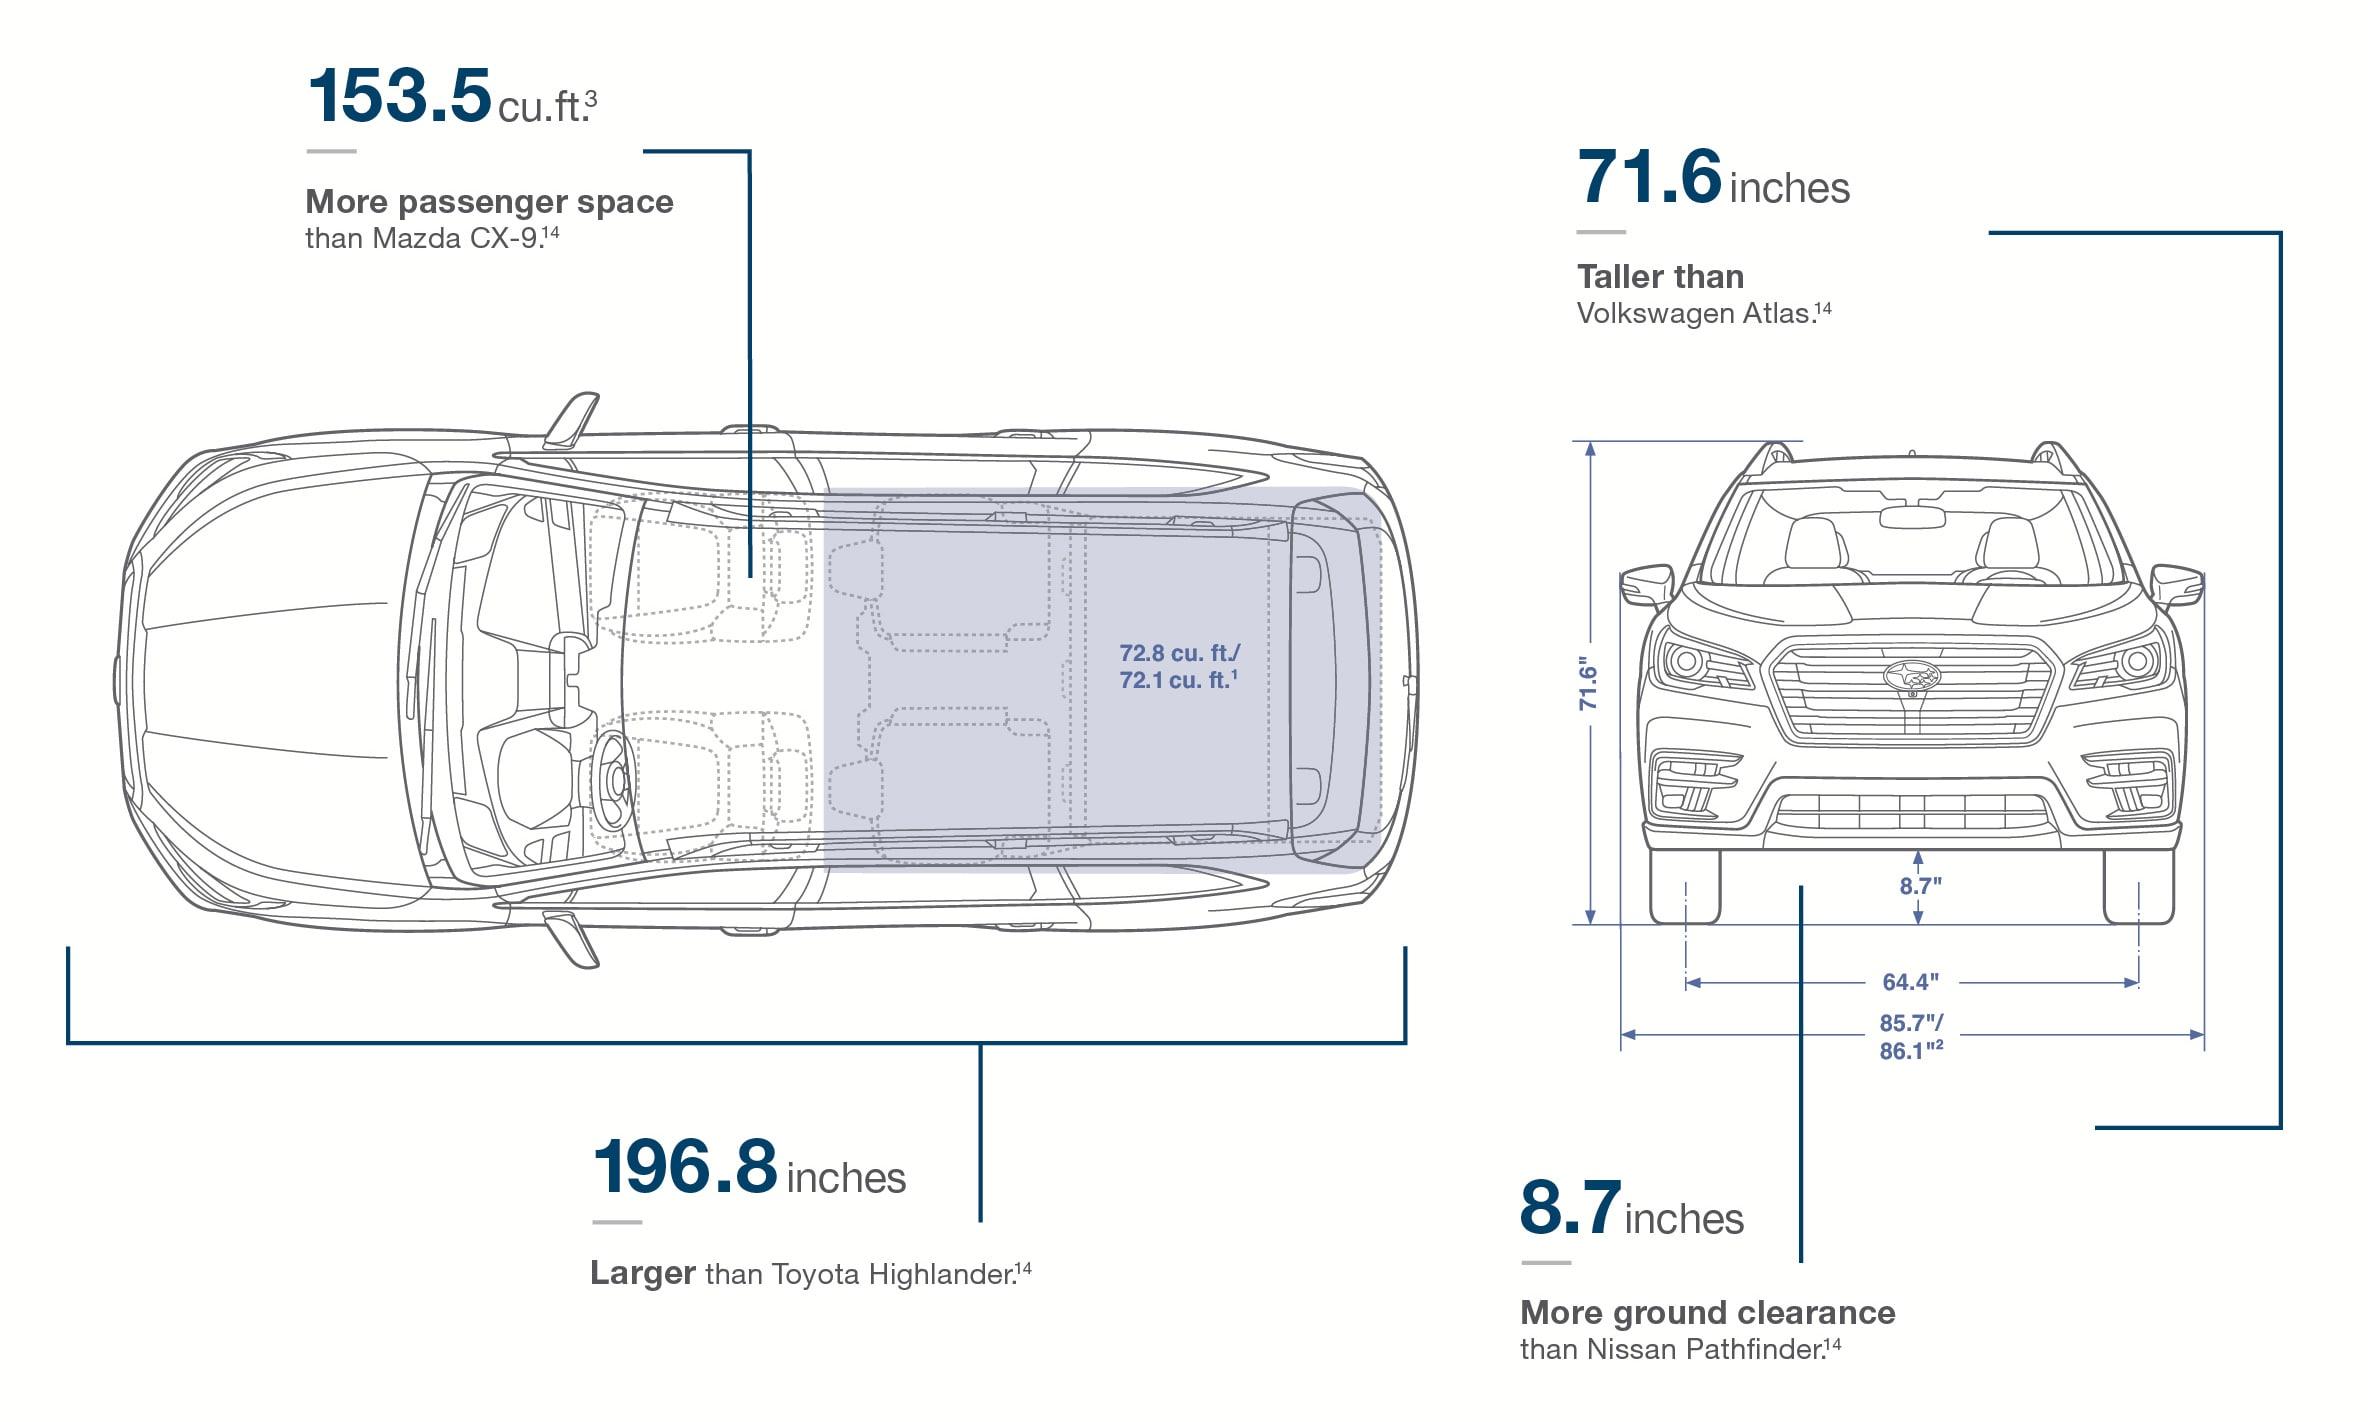 Subaru Suv Tulsa | 2018, 2019, 2020 Ford Cars